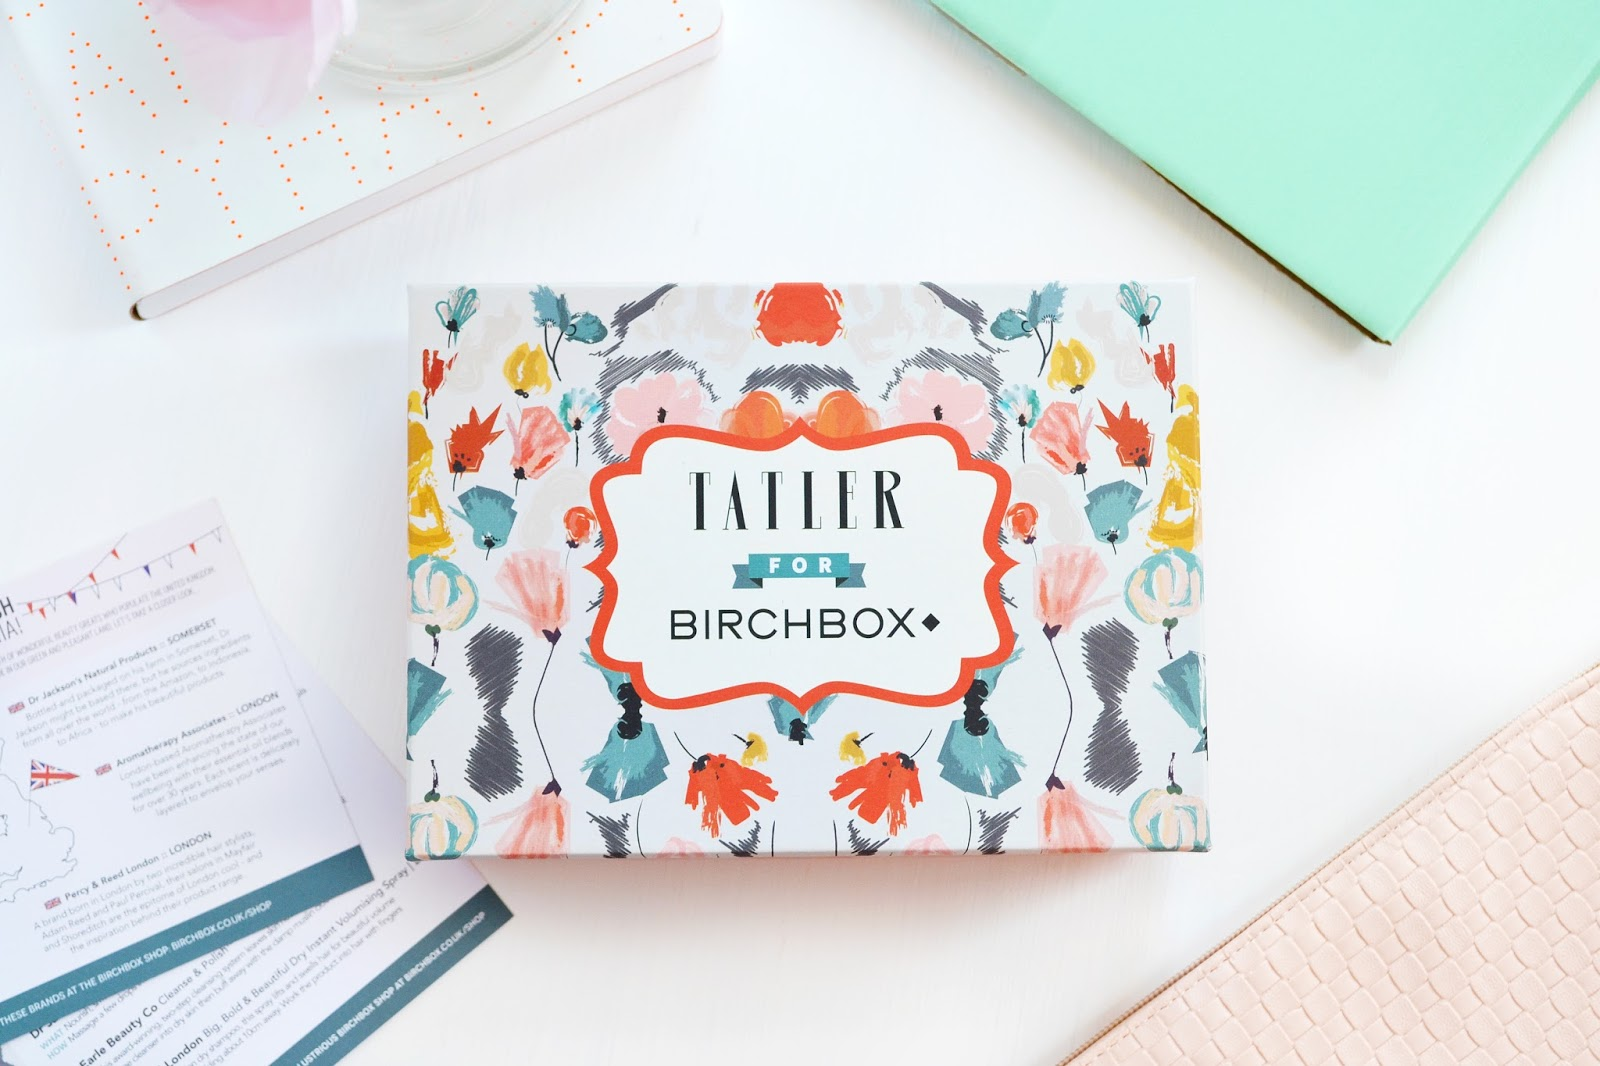 Birchbox tatler, birchbox april 2015